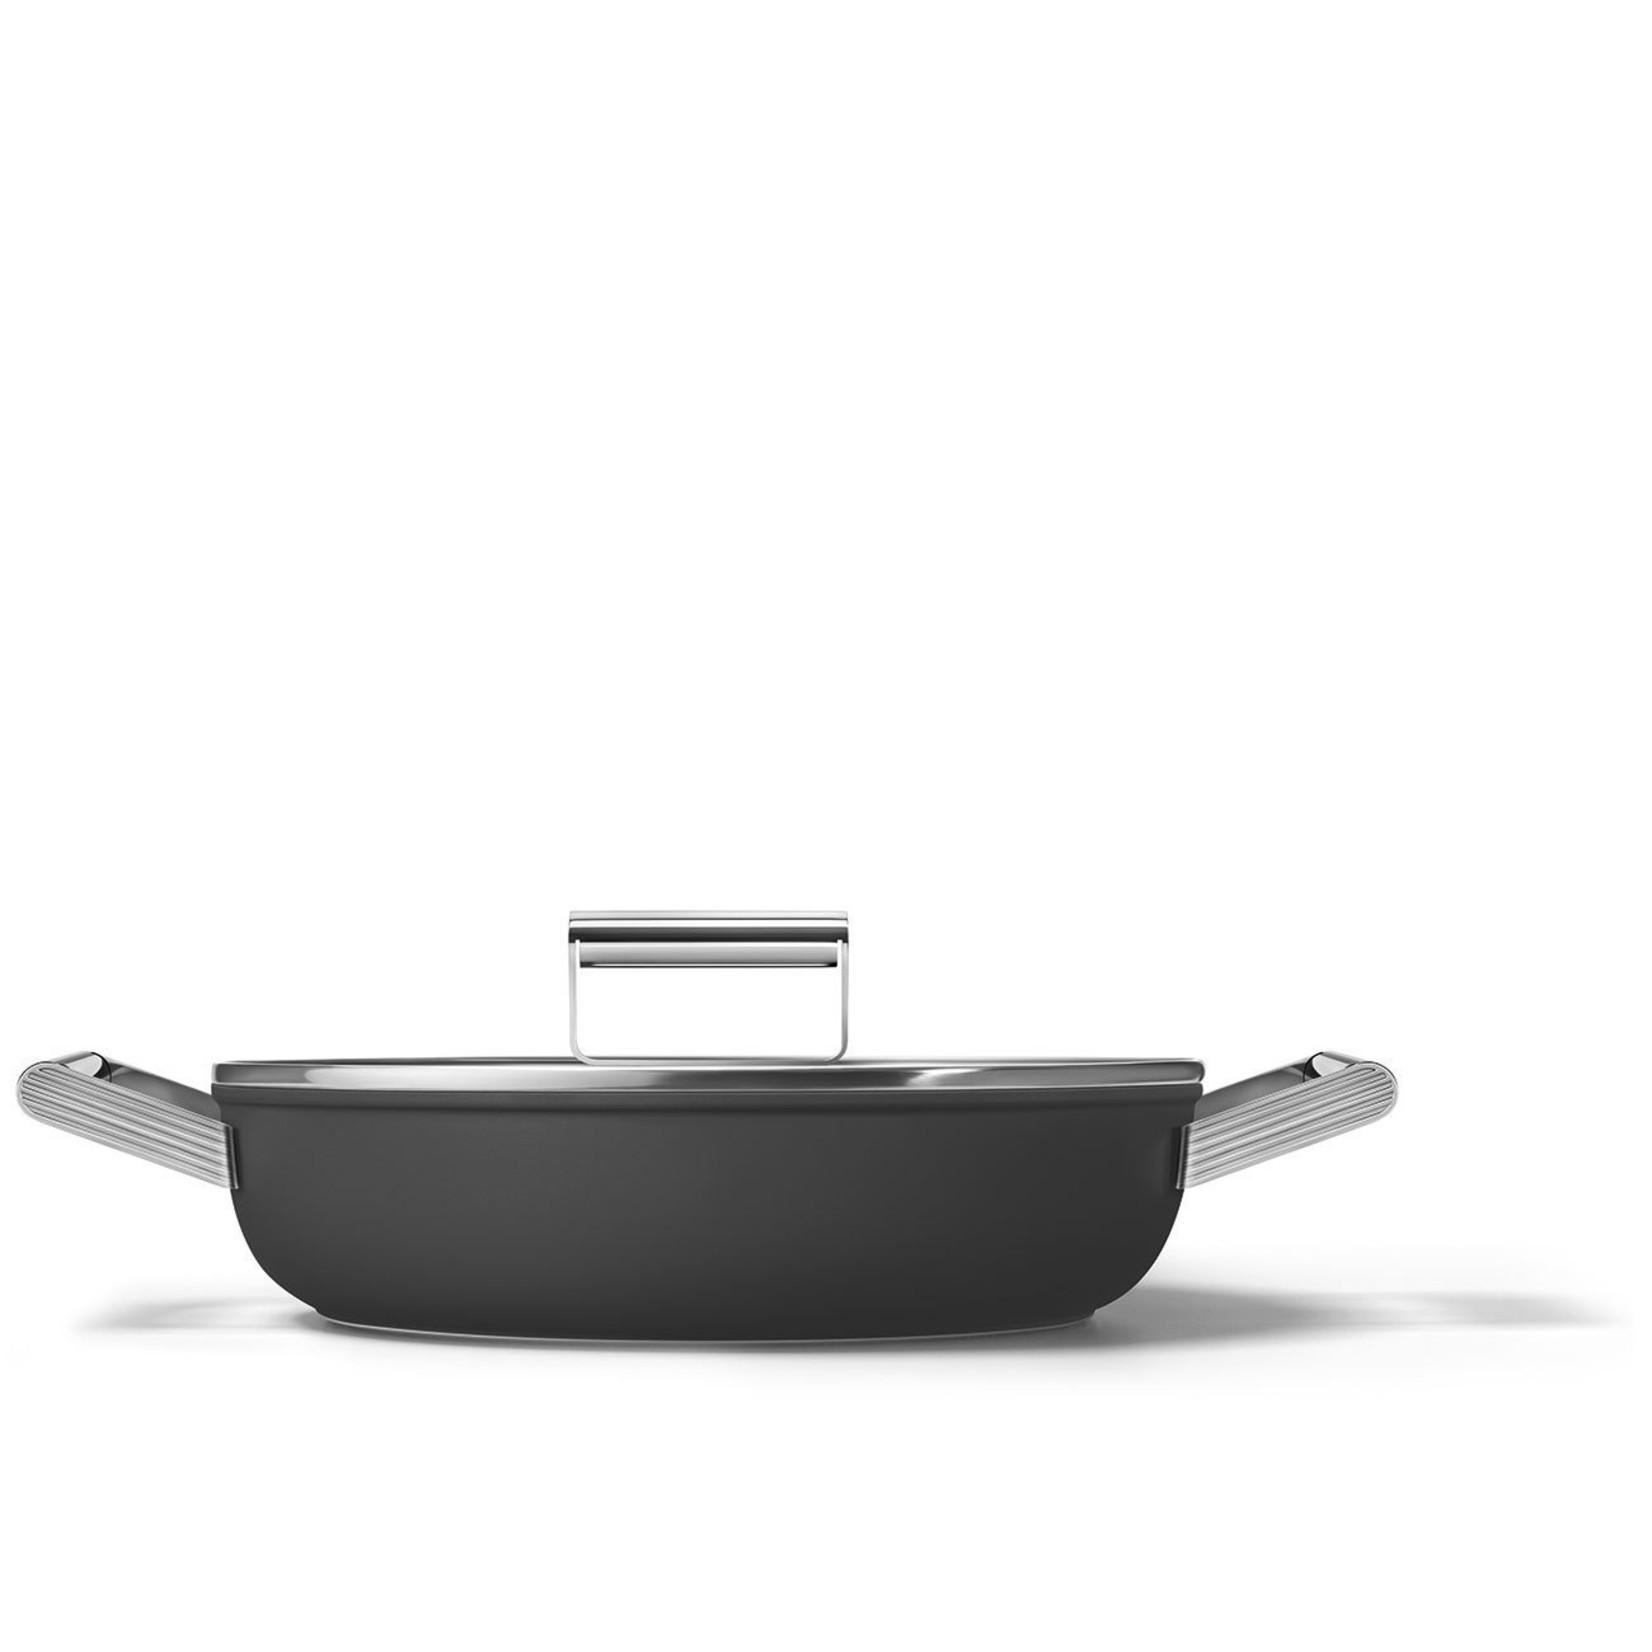 Smeg SMEG Smoorpan met deksel 28 cm, anti-aanbaklaag, zwart mat